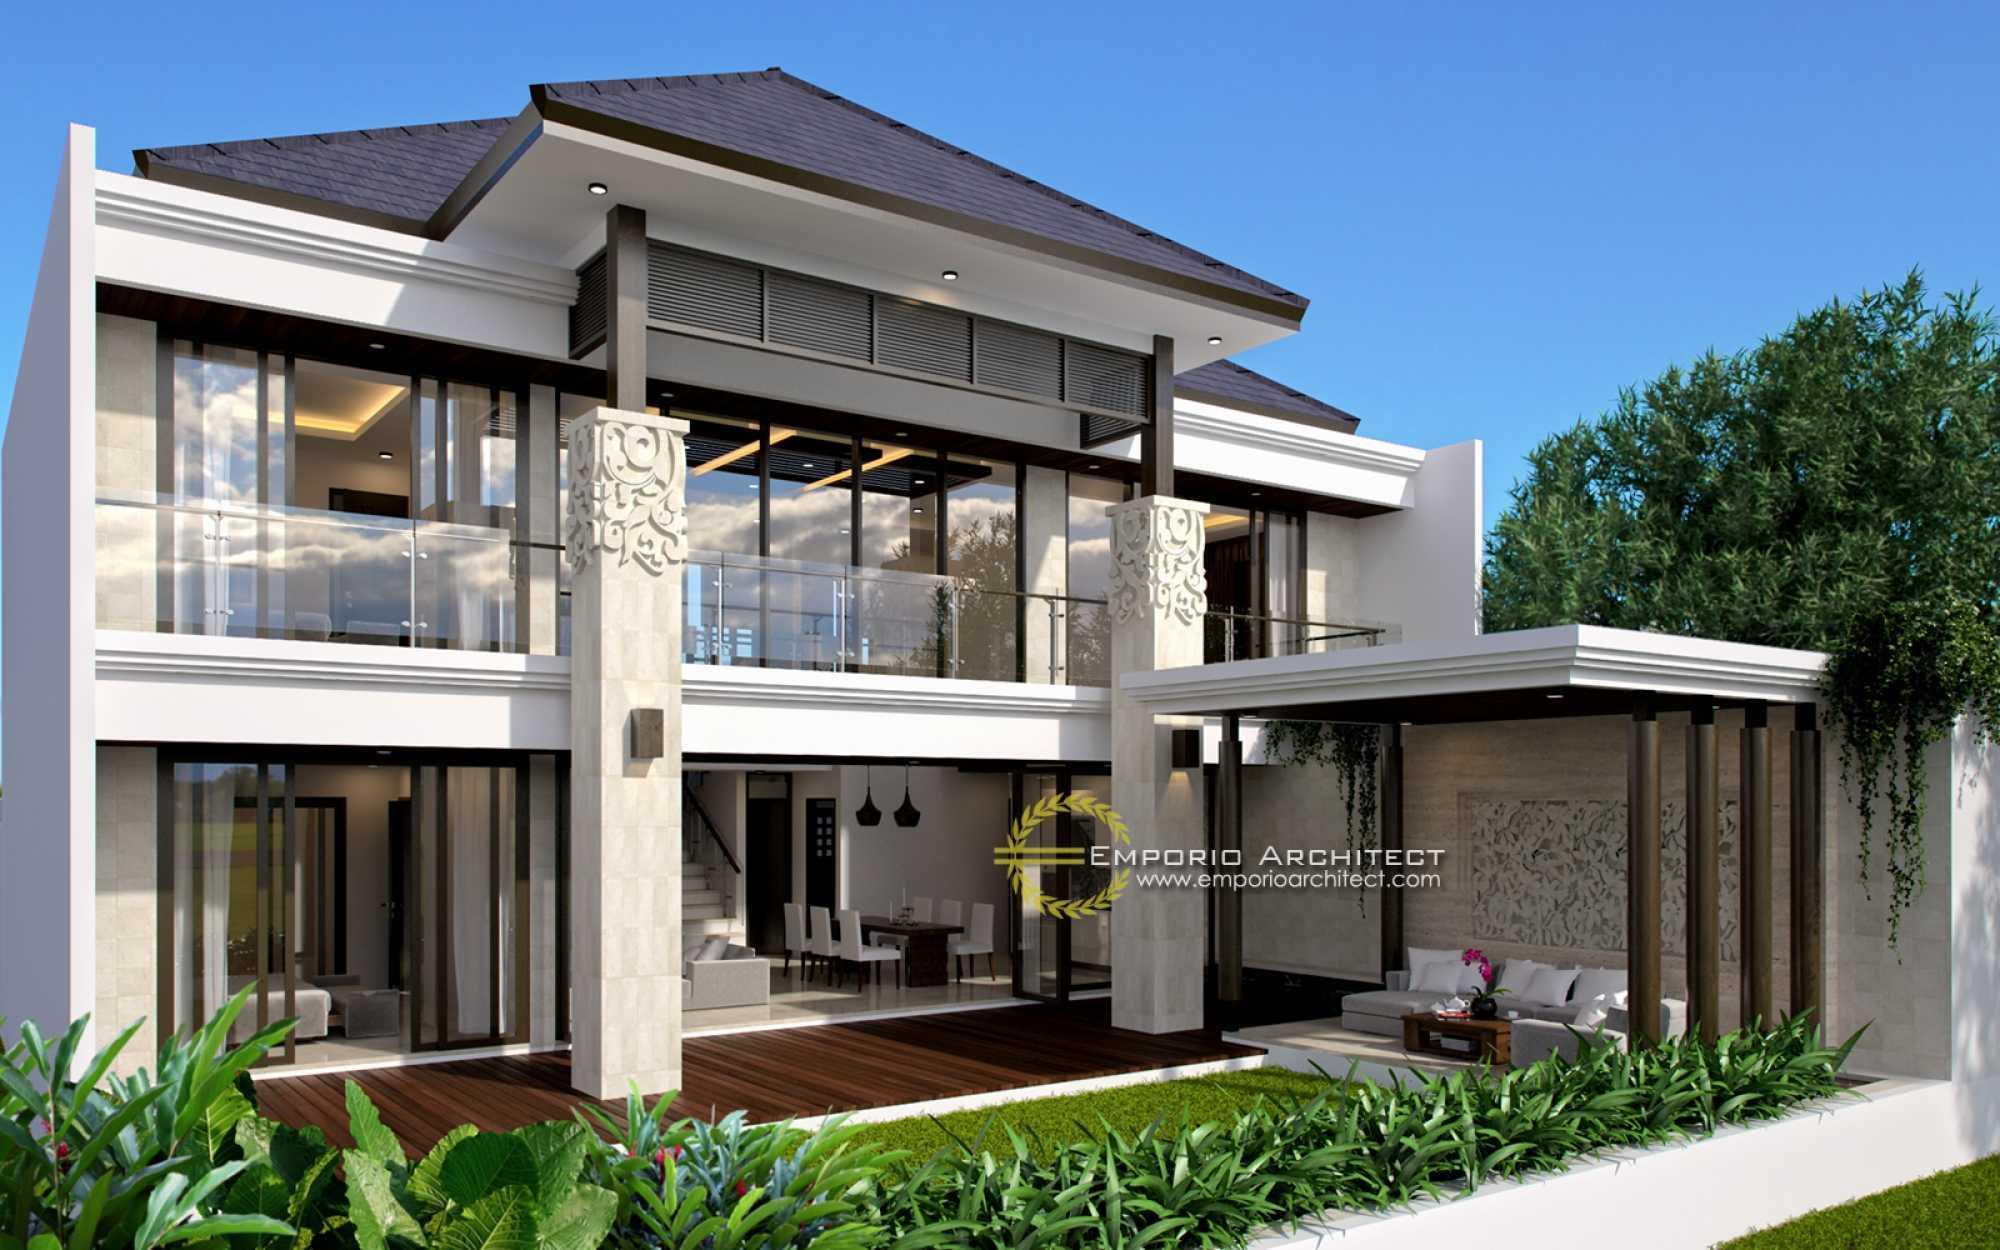 Emporio Architect Desain Rumah Villa Bali Tropis 270 @ Cibubur, Jakarta Timur Cibubur, Kec. Ciracas, Kota Jakarta Timur, Daerah Khusus Ibukota Jakarta, Indonesia Cibubur, Kec. Ciracas, Kota Jakarta Timur, Daerah Khusus Ibukota Jakarta, Indonesia Emporio-Architect-Desain-Rumah-Villa-Bali-Tropis-270-Cibubur-Jakarta-Timur Tropical 73728